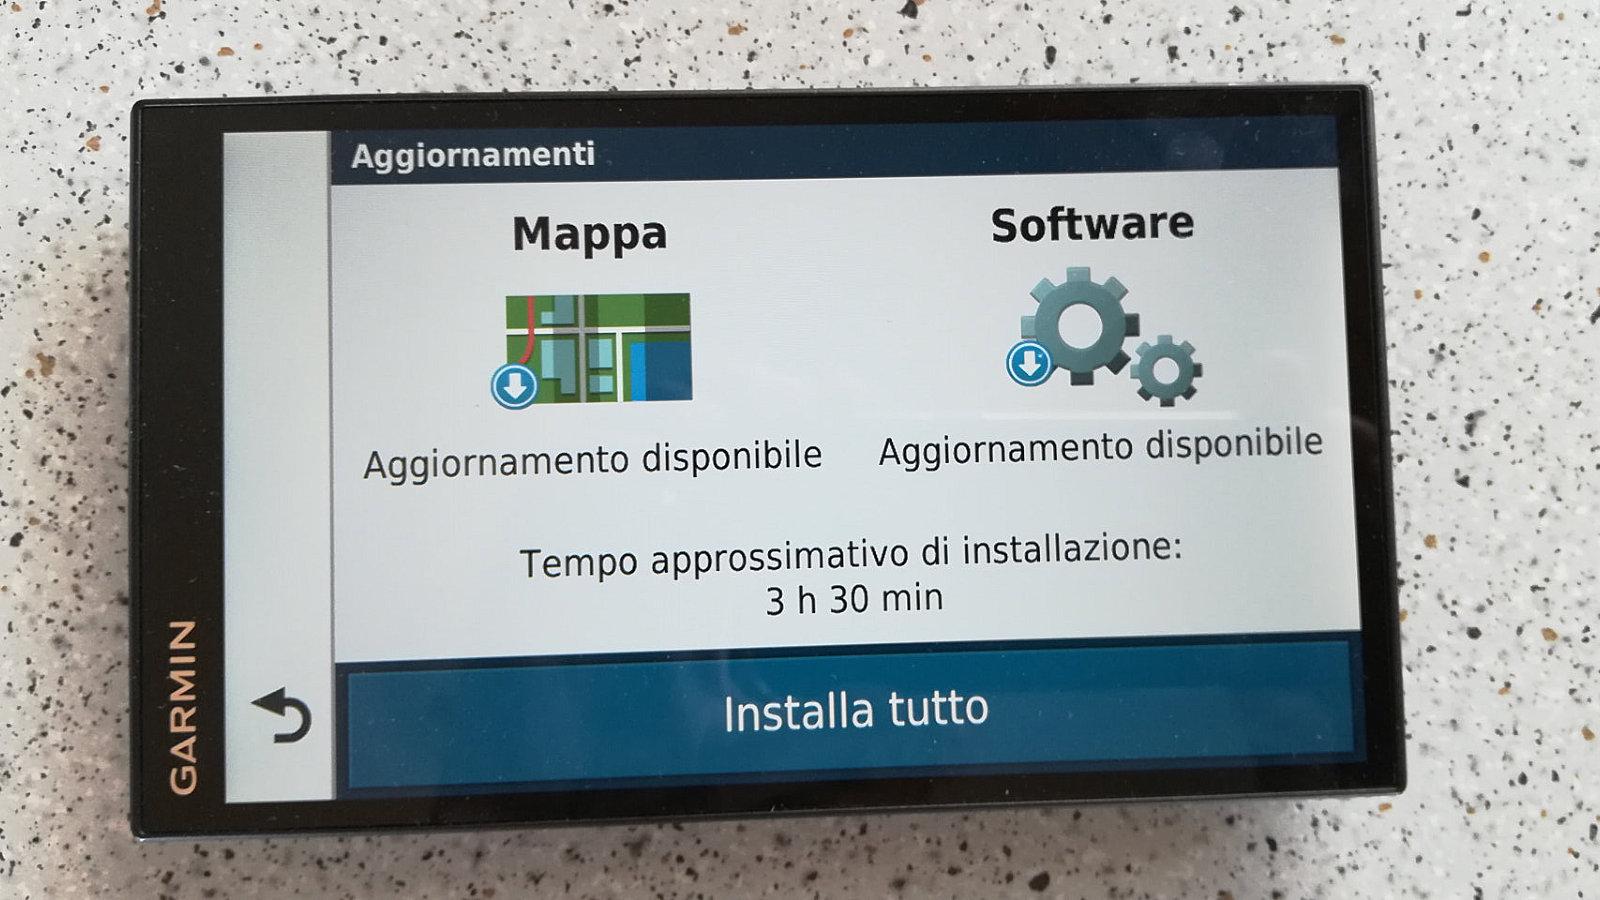 Navigatore Camper Garmin Aggiornamenti Mappa Software Featured